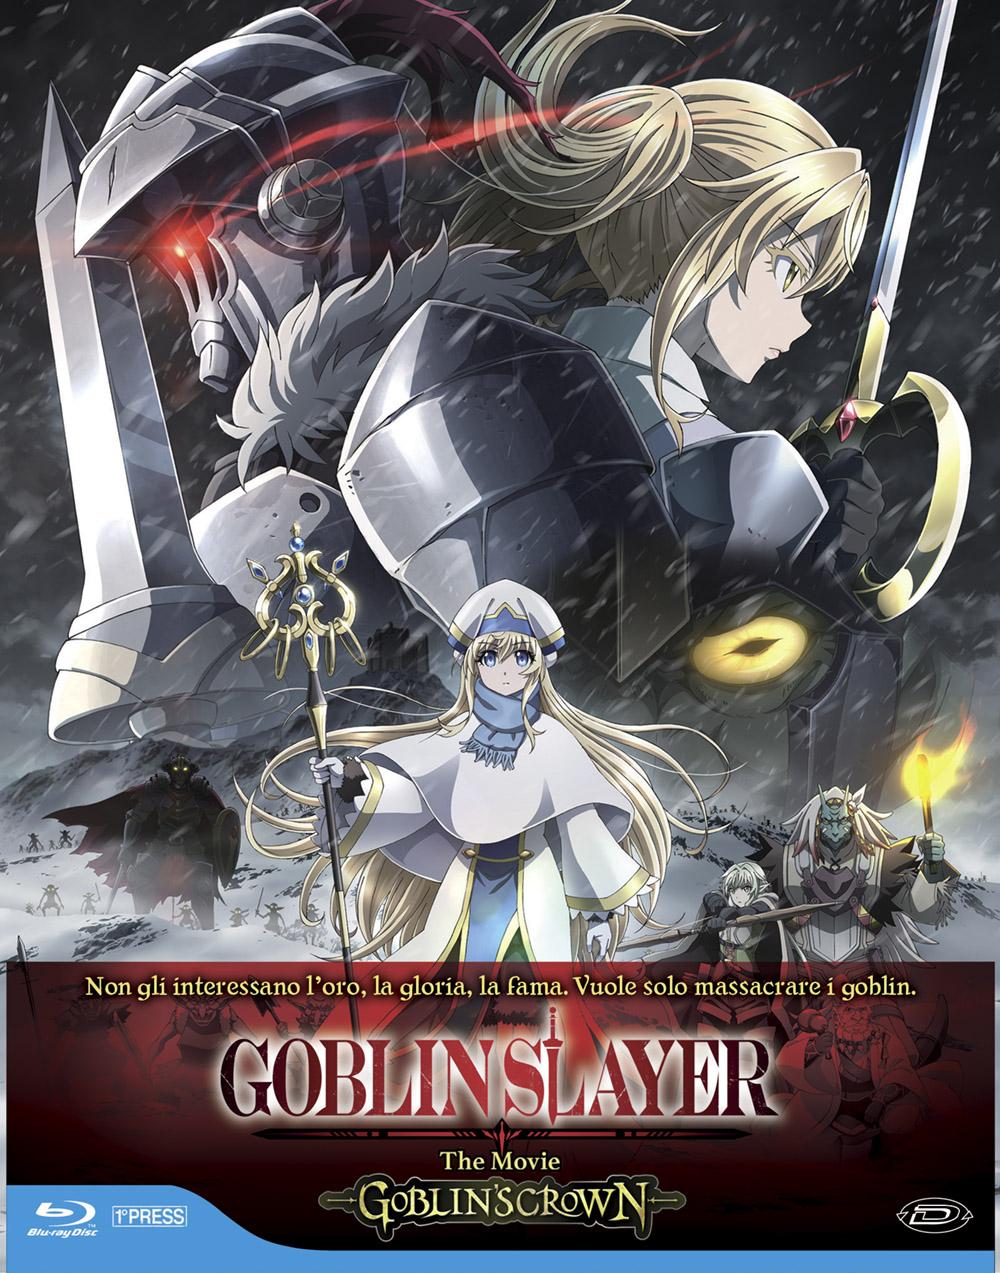 GOBLIN SLAYER THE MOVIE: GOBLIN'S CROWN (FIRST PRESS) - BLU RAY